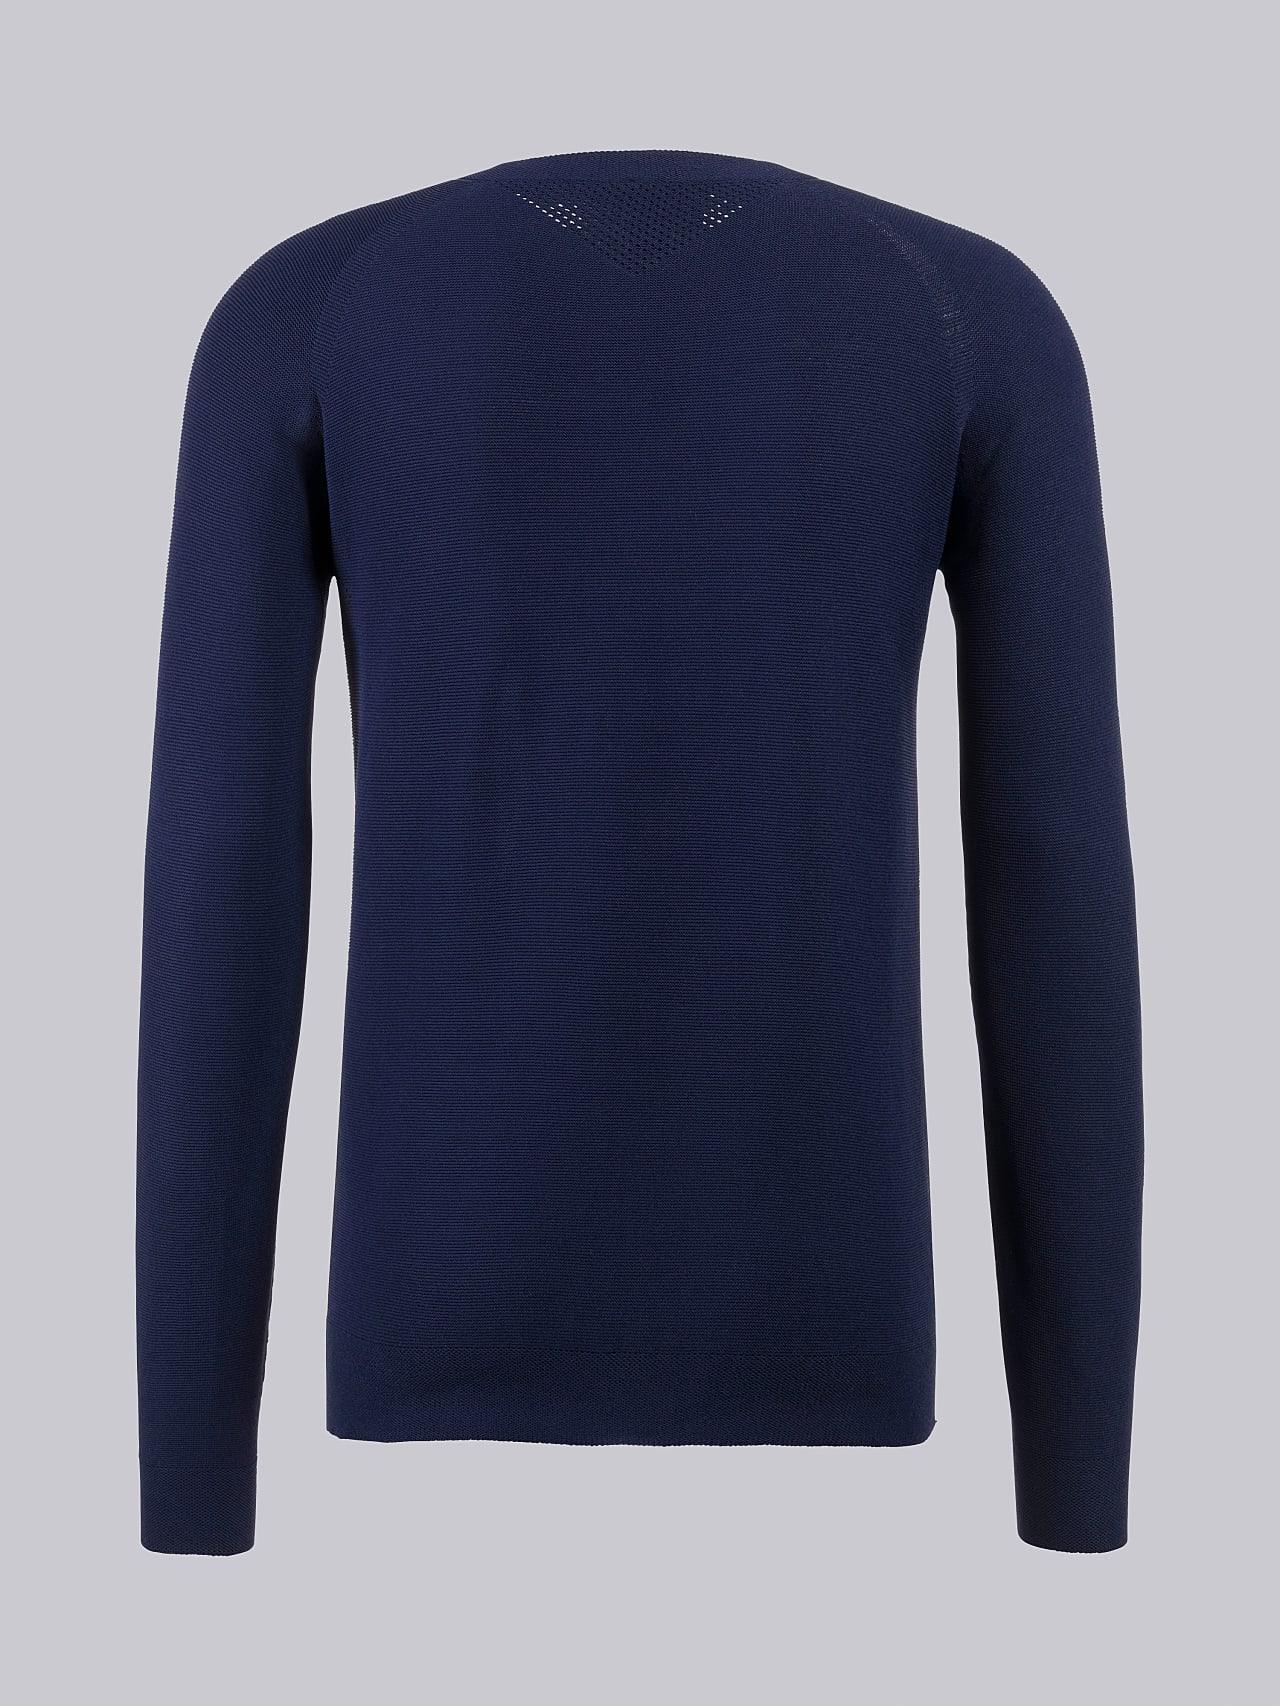 FOSOP V3.Y4.02 Seamless Knit Sweater navy Left Alpha Tauri